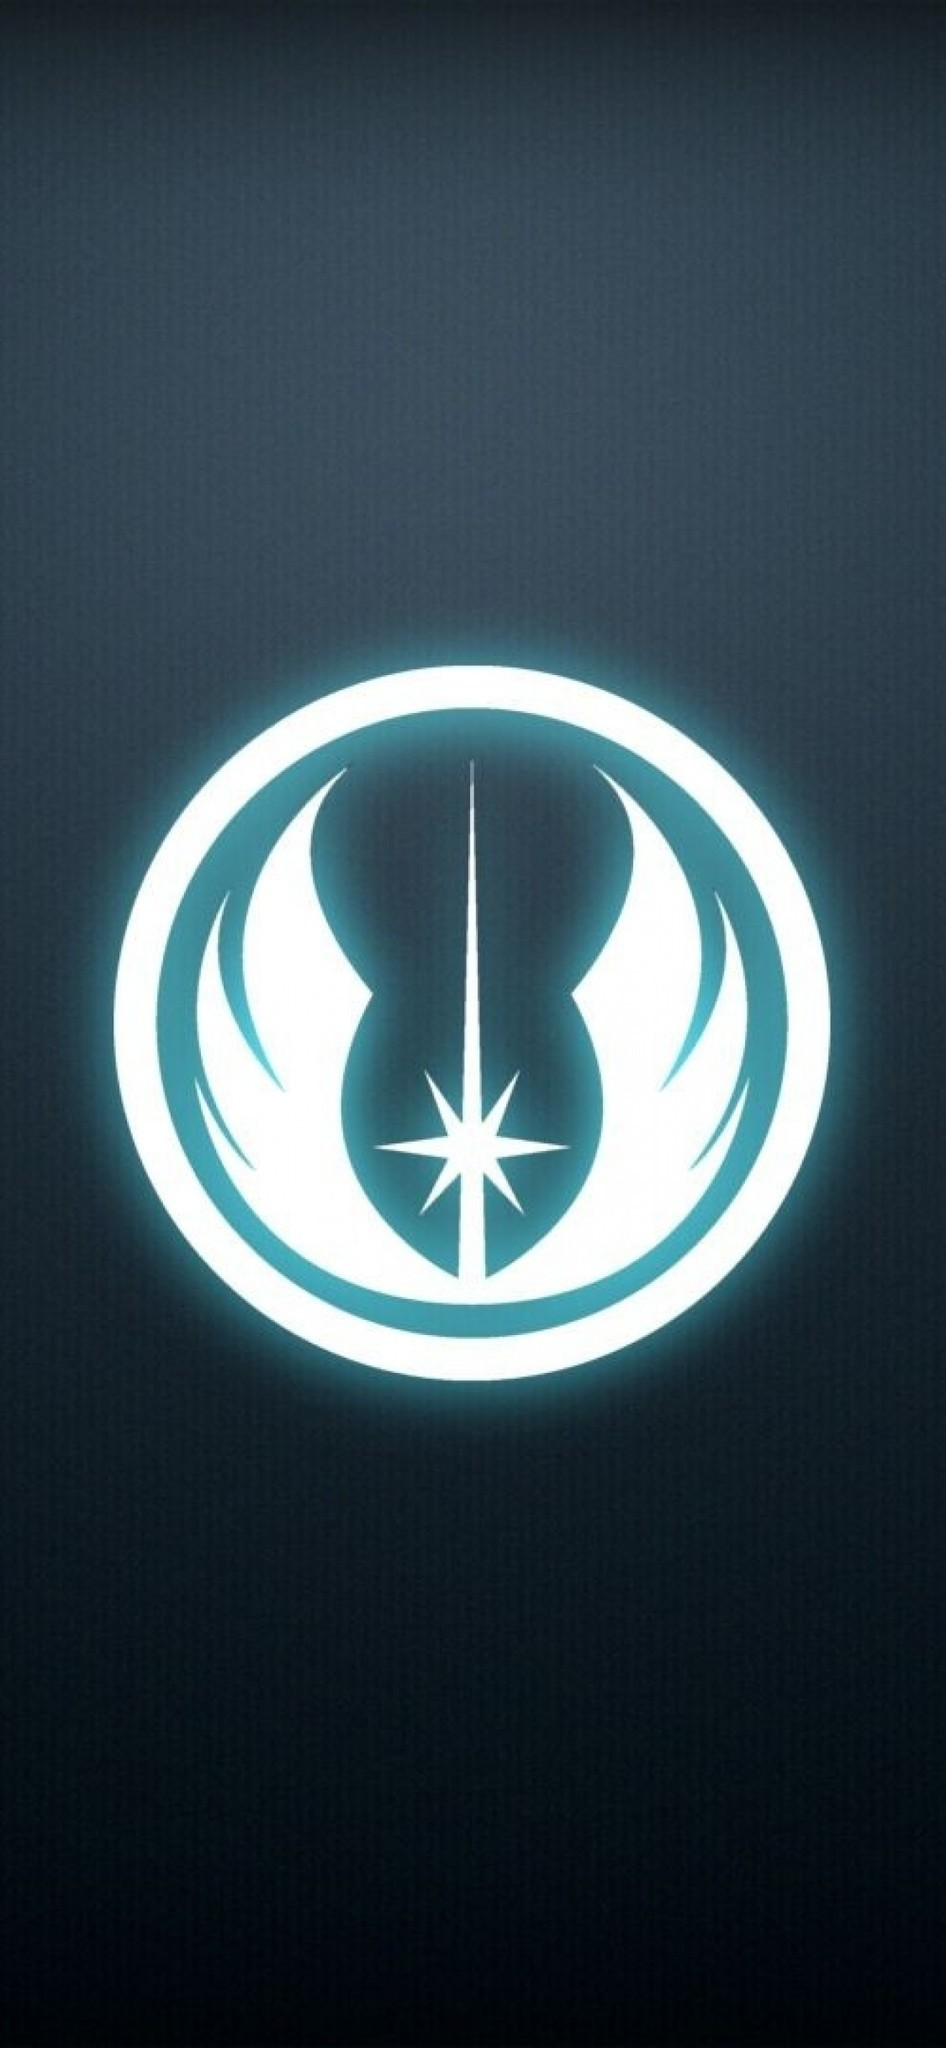 The Jedi Order Star Wars Wallpaper Iphone 946x2048 Download Hd Wallpaper Wallpapertip